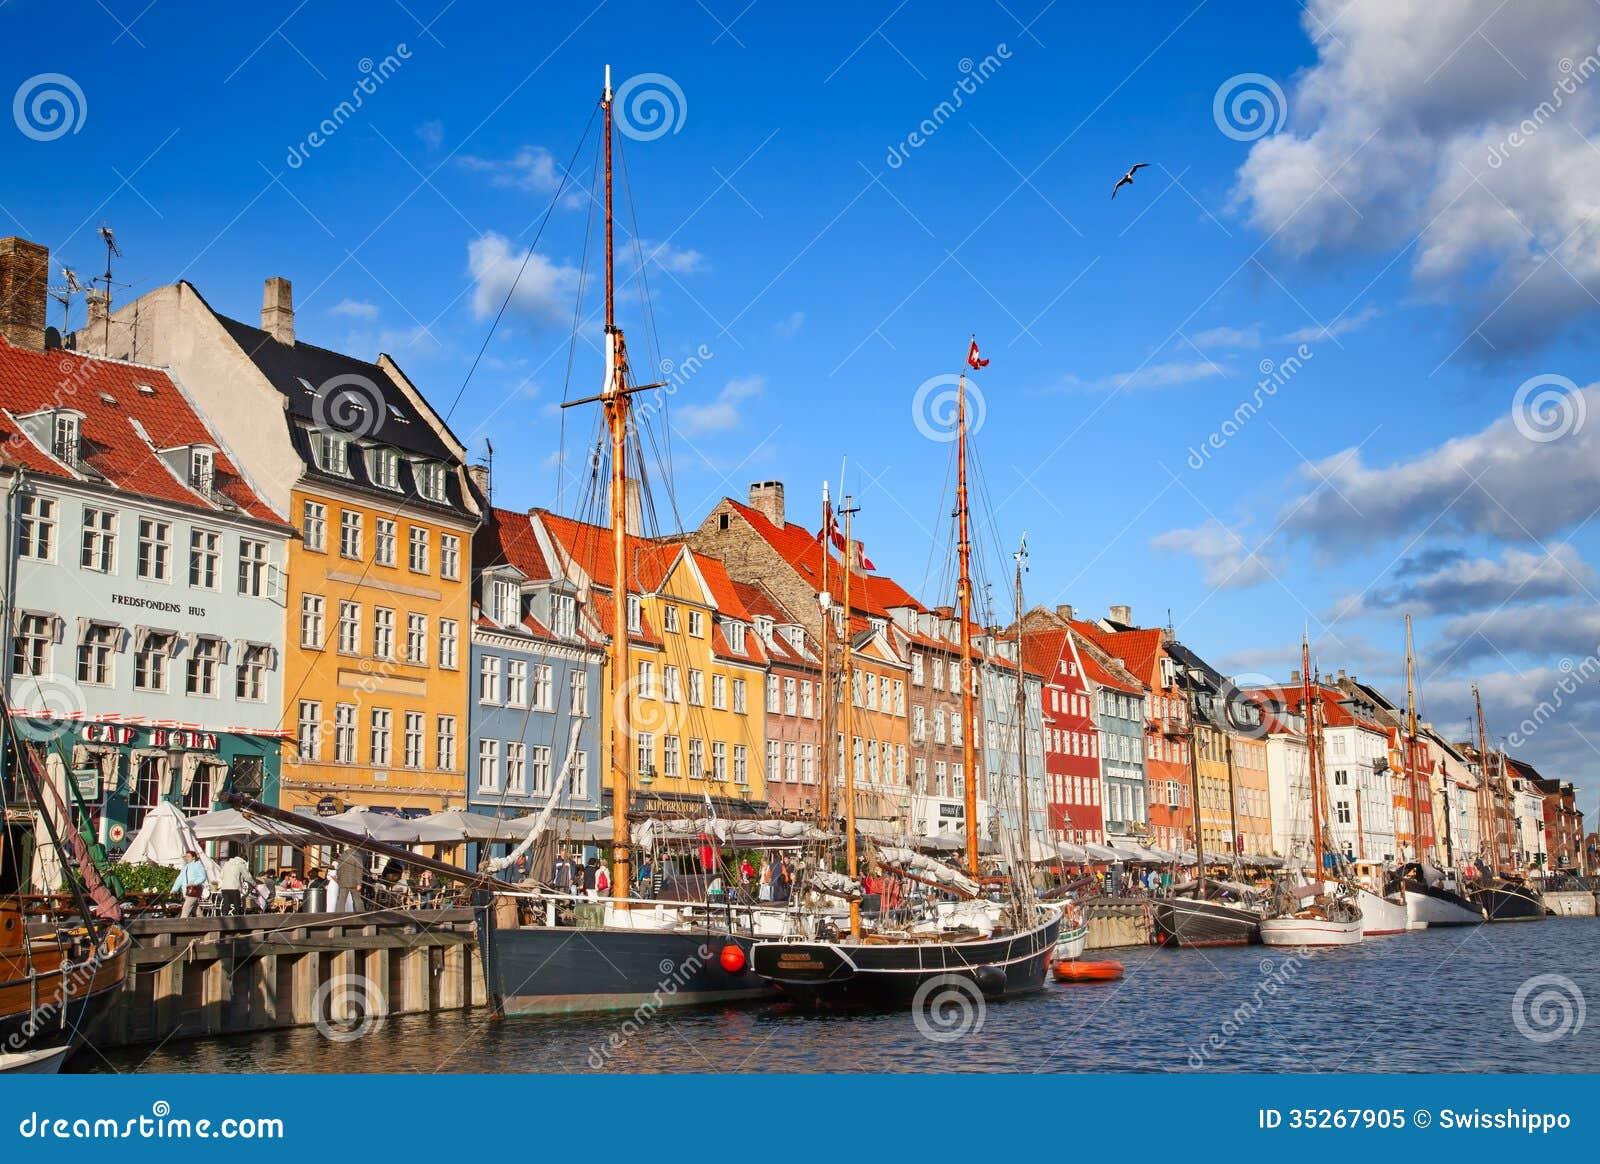 Copenhagen Nyhavn District In A Sunny Summer Day